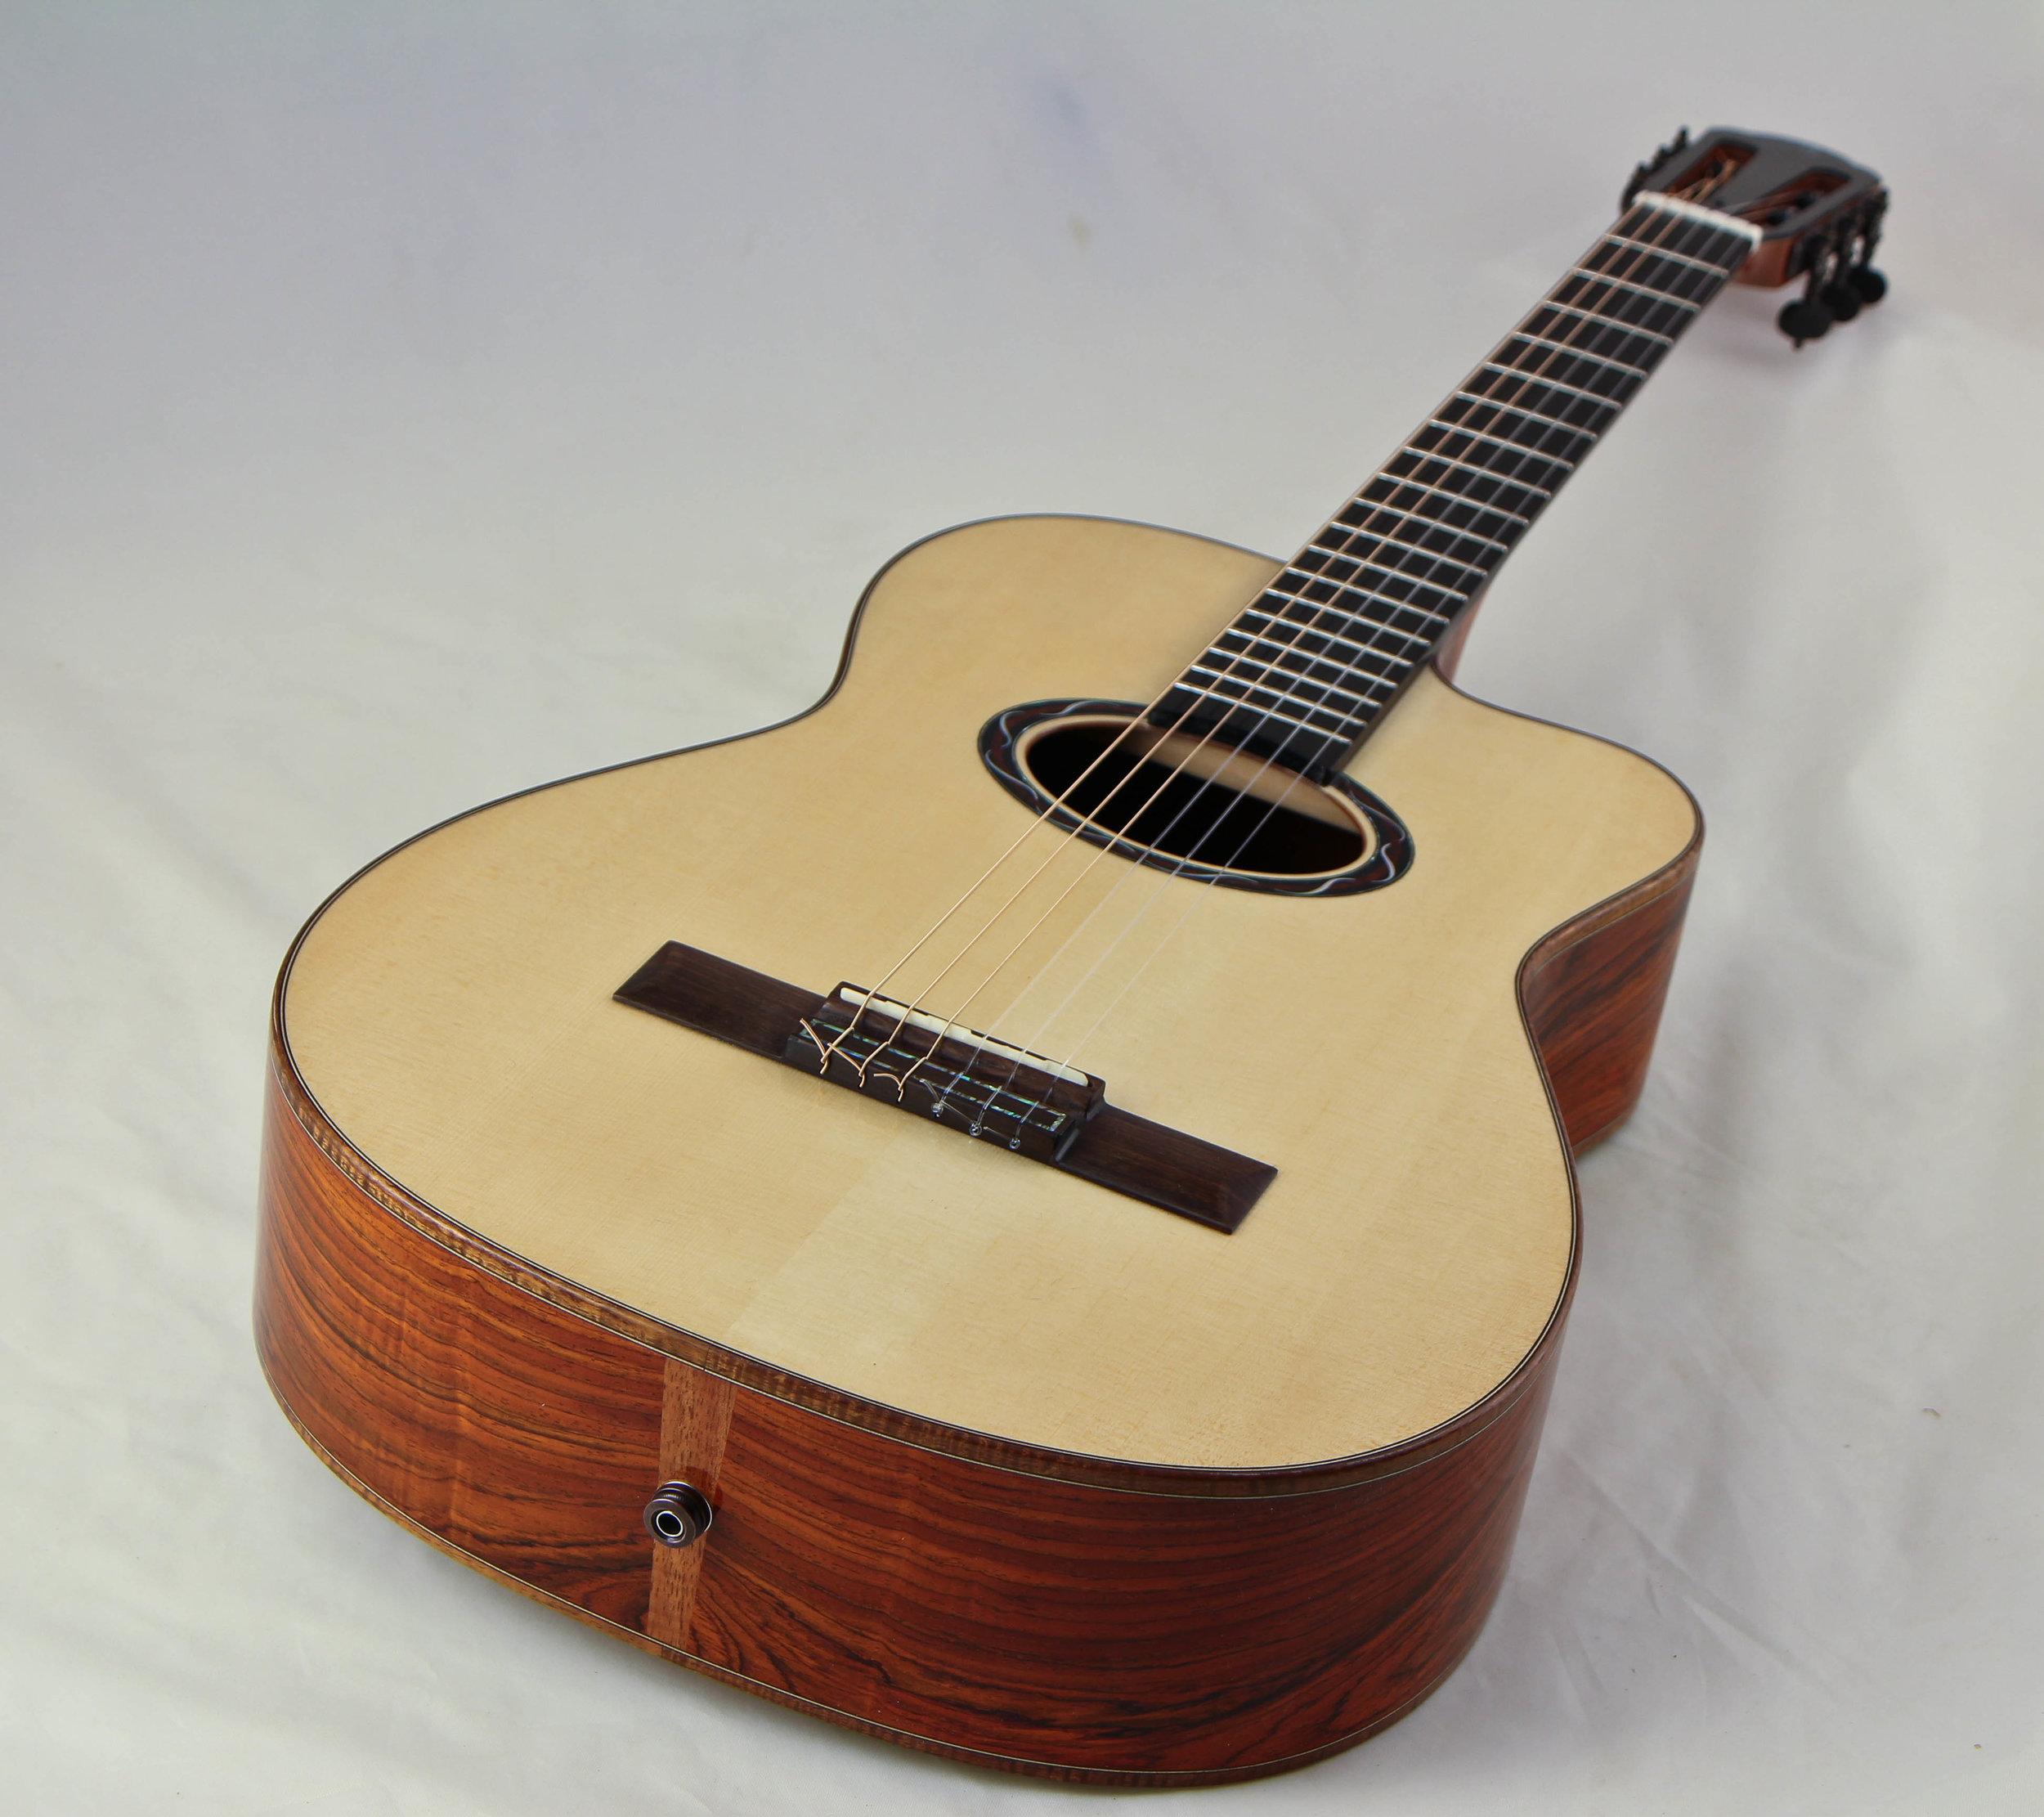 rosewoodcab-4.JPG